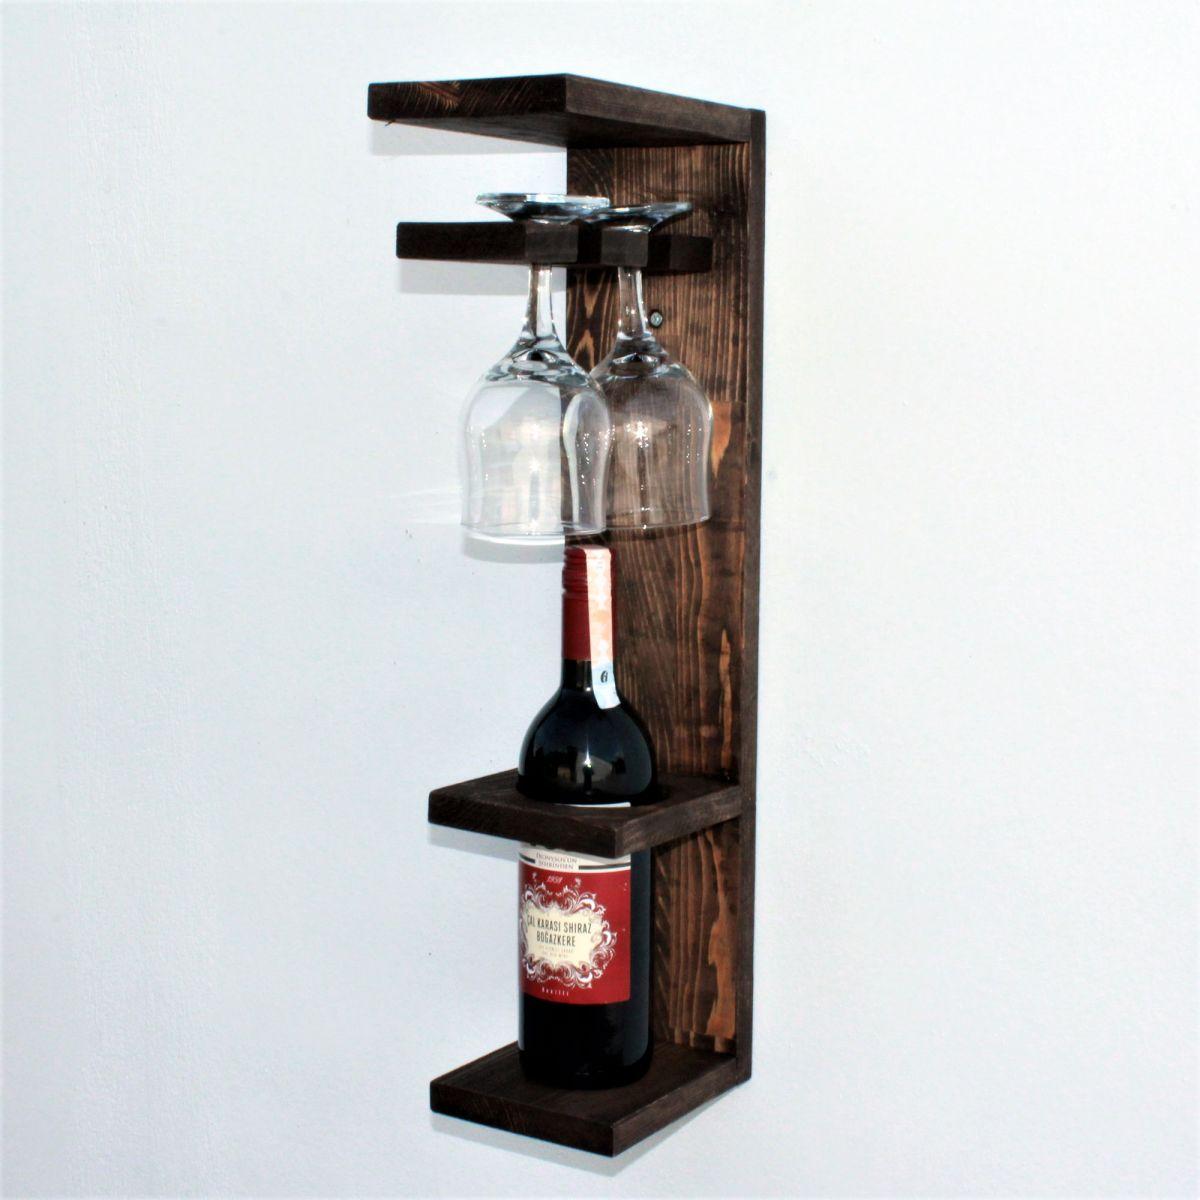 Suport sticla vin din lemn 1001 Homs 12 x 55 x 15 cm, Maro